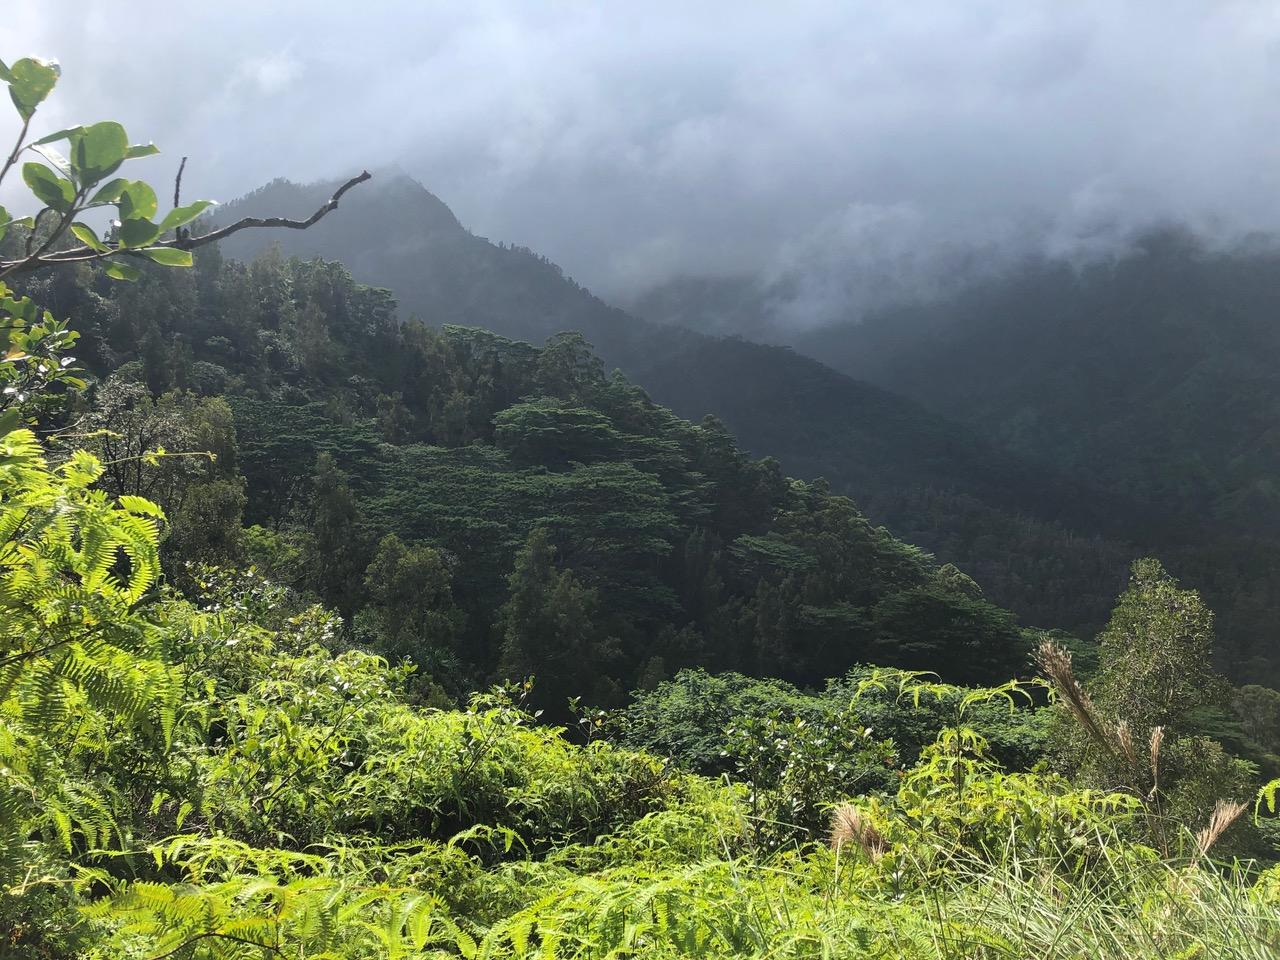 View off Okolehao Trail into the jungle